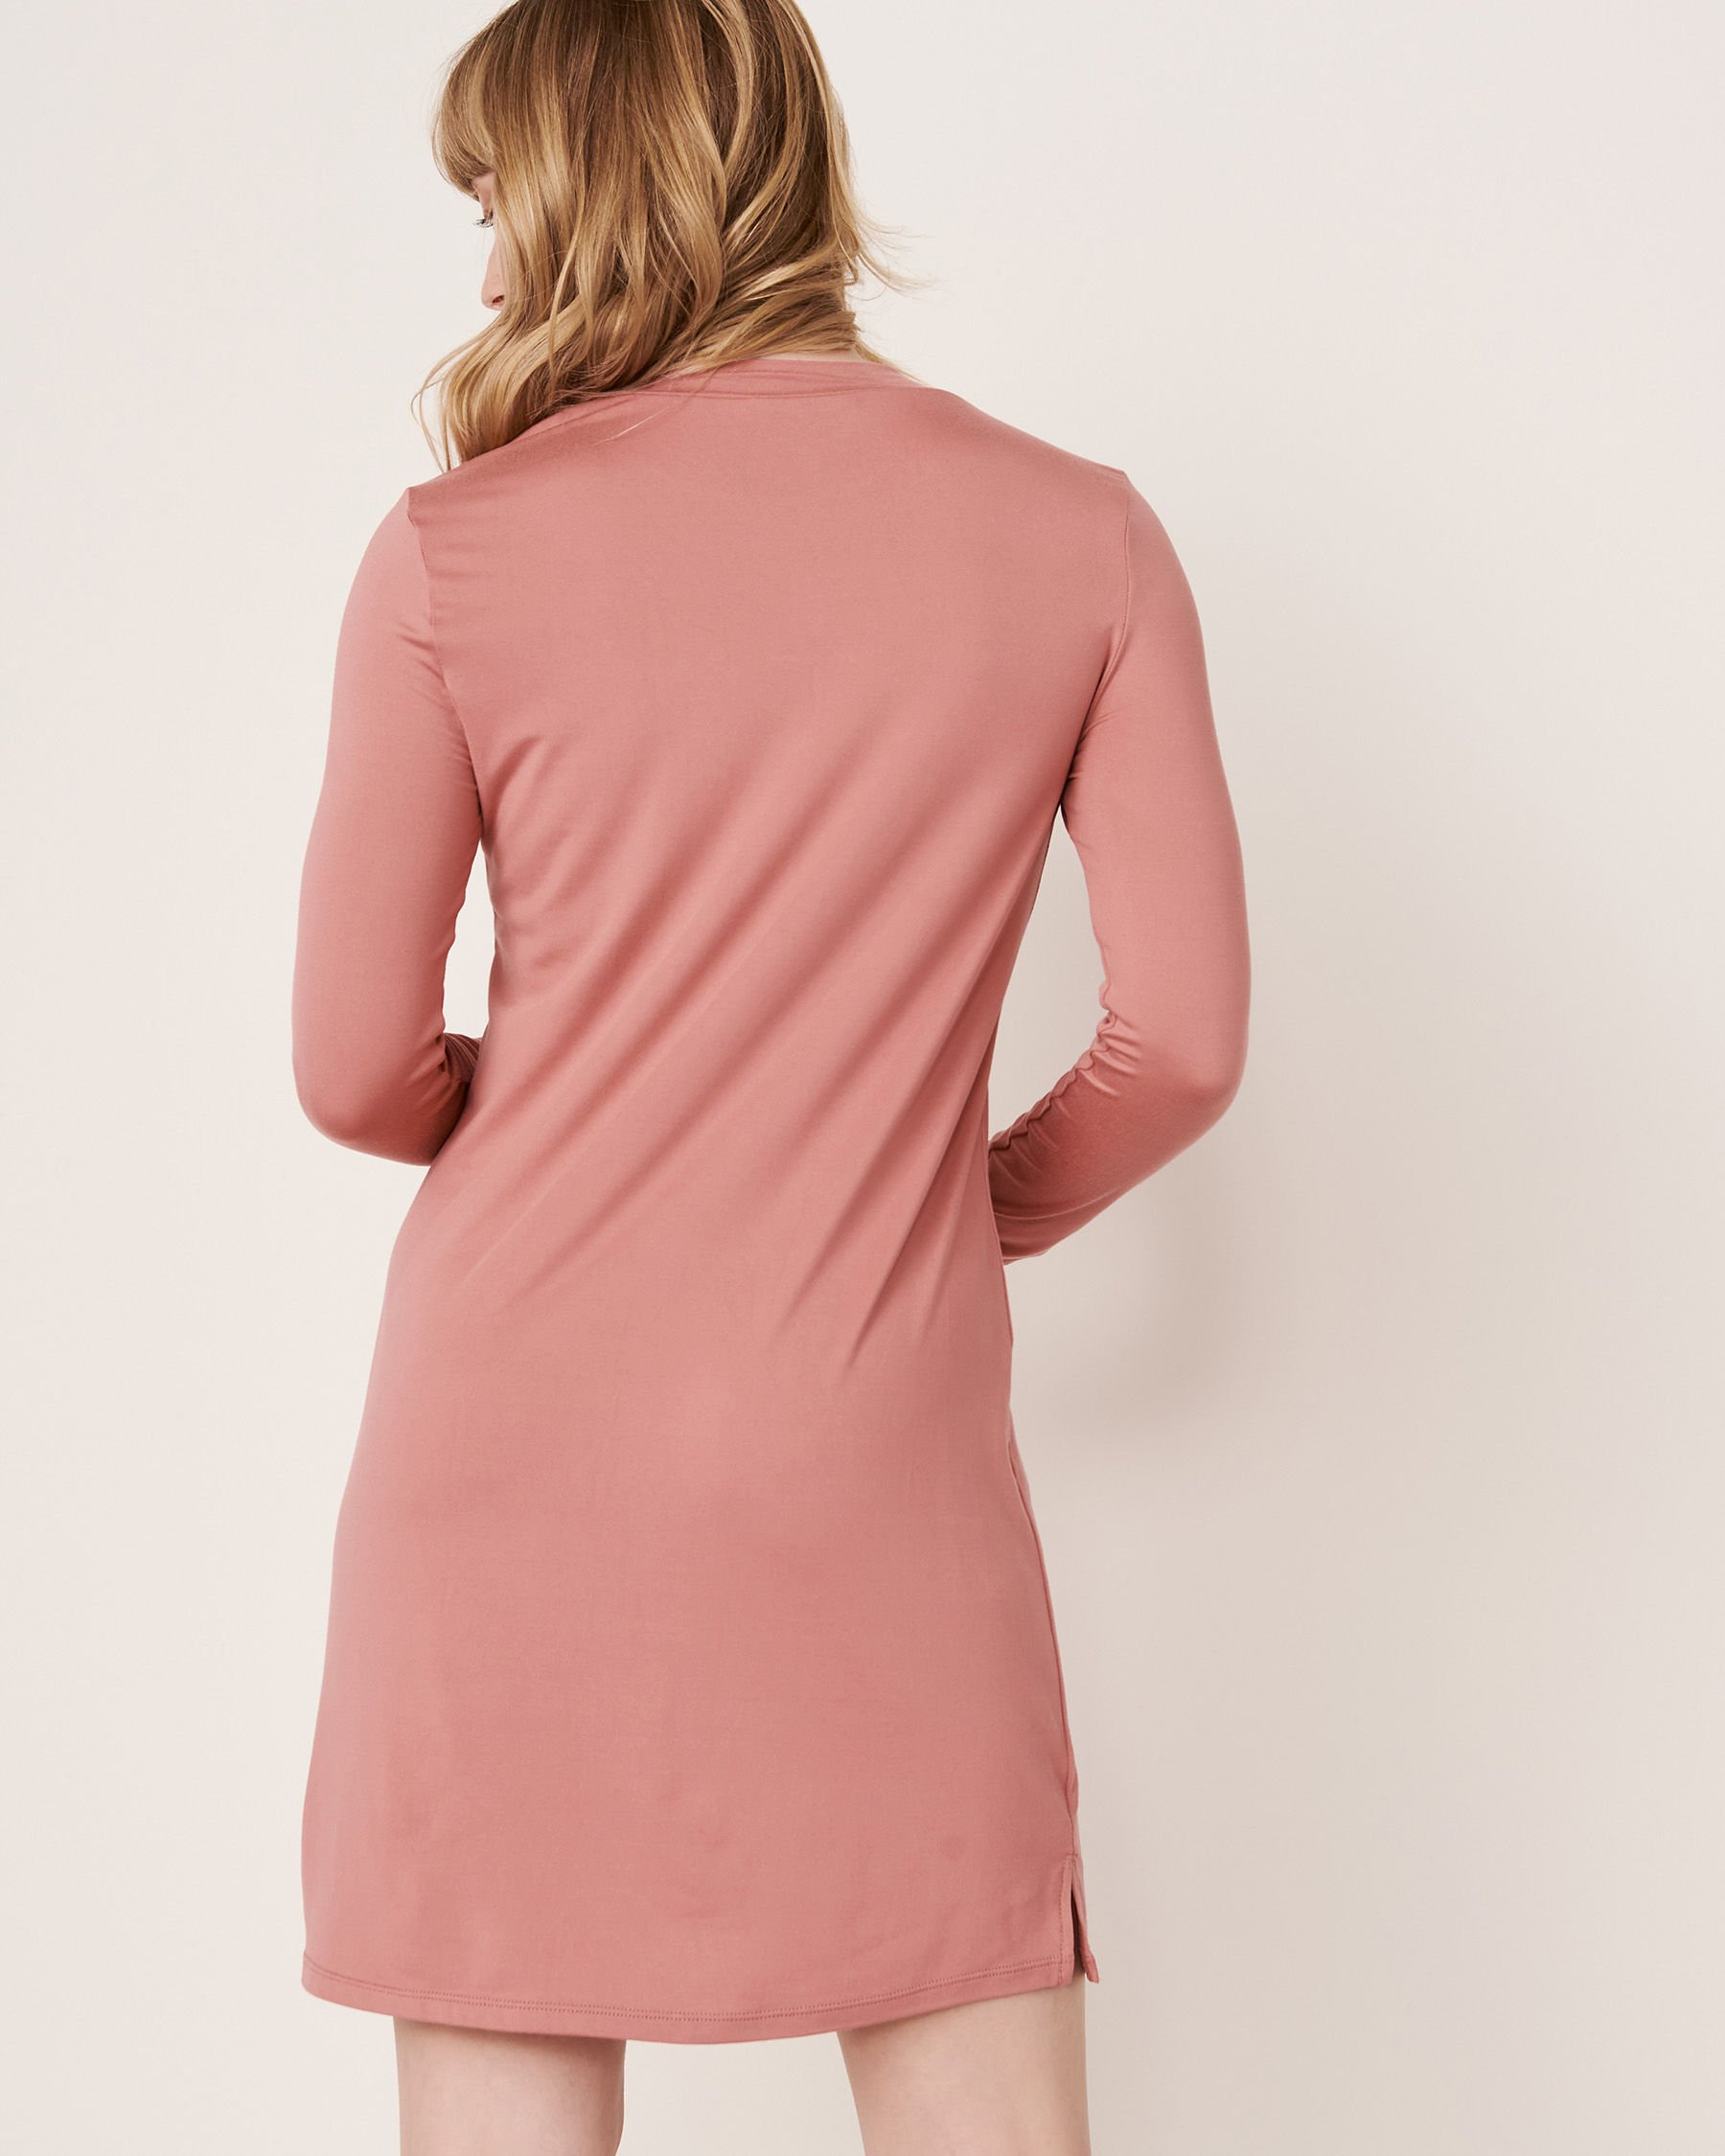 LA VIE EN ROSE High Neck Long Sleeve Sleepshirt Dusty rose 40500076 - View2